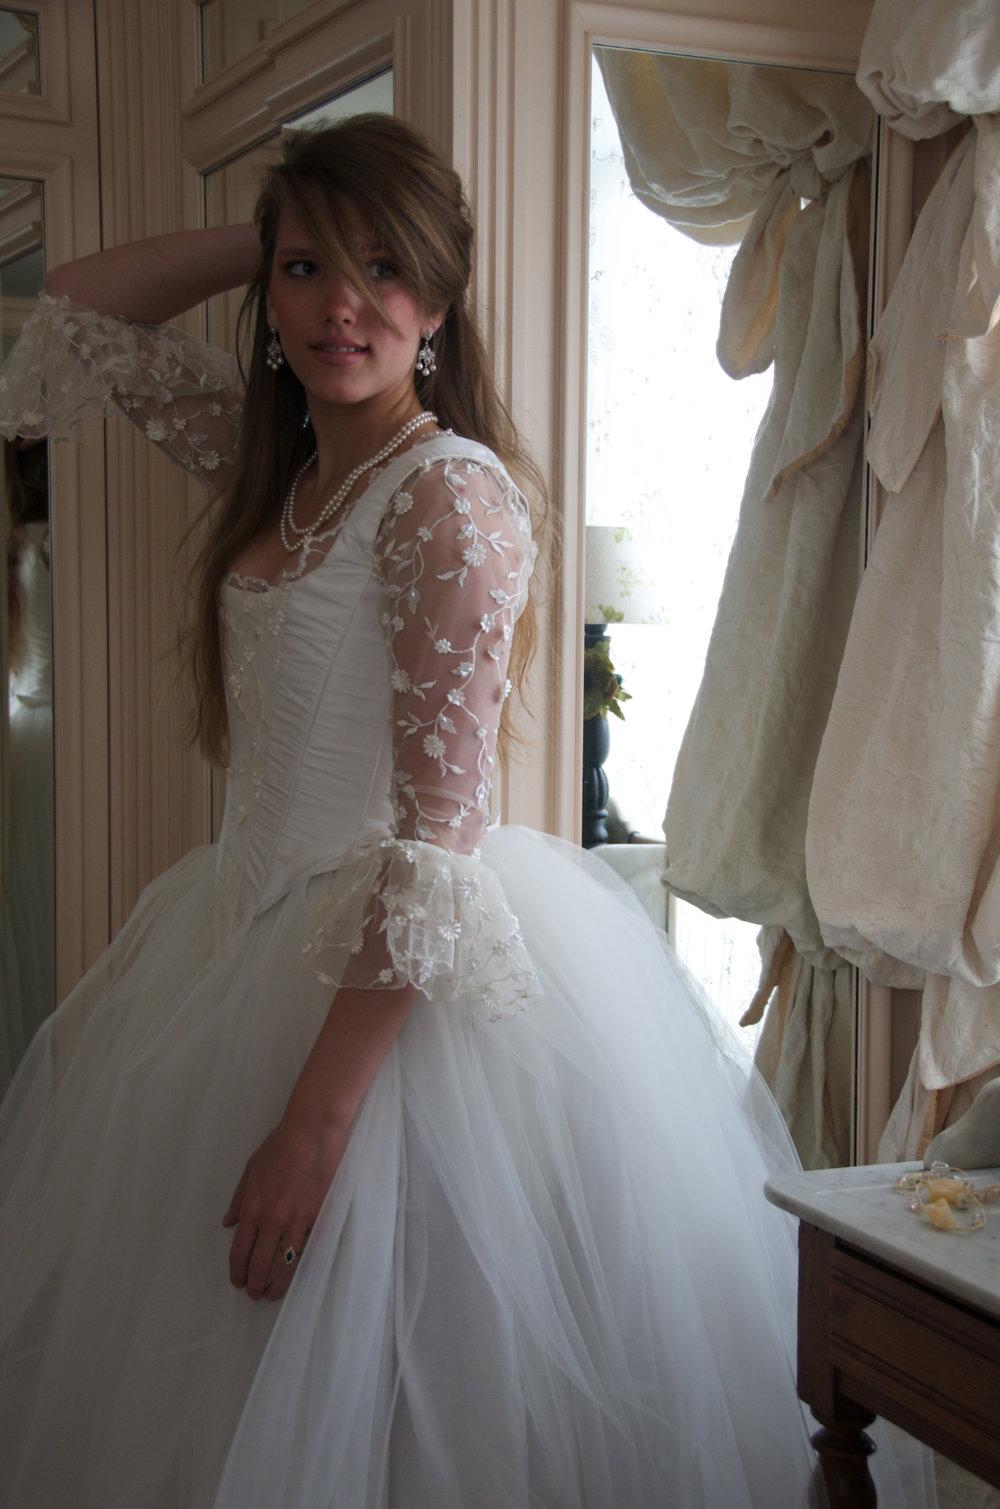 Robe de mariée inspiration 18e siècle Agnès Szabelewski.jpg